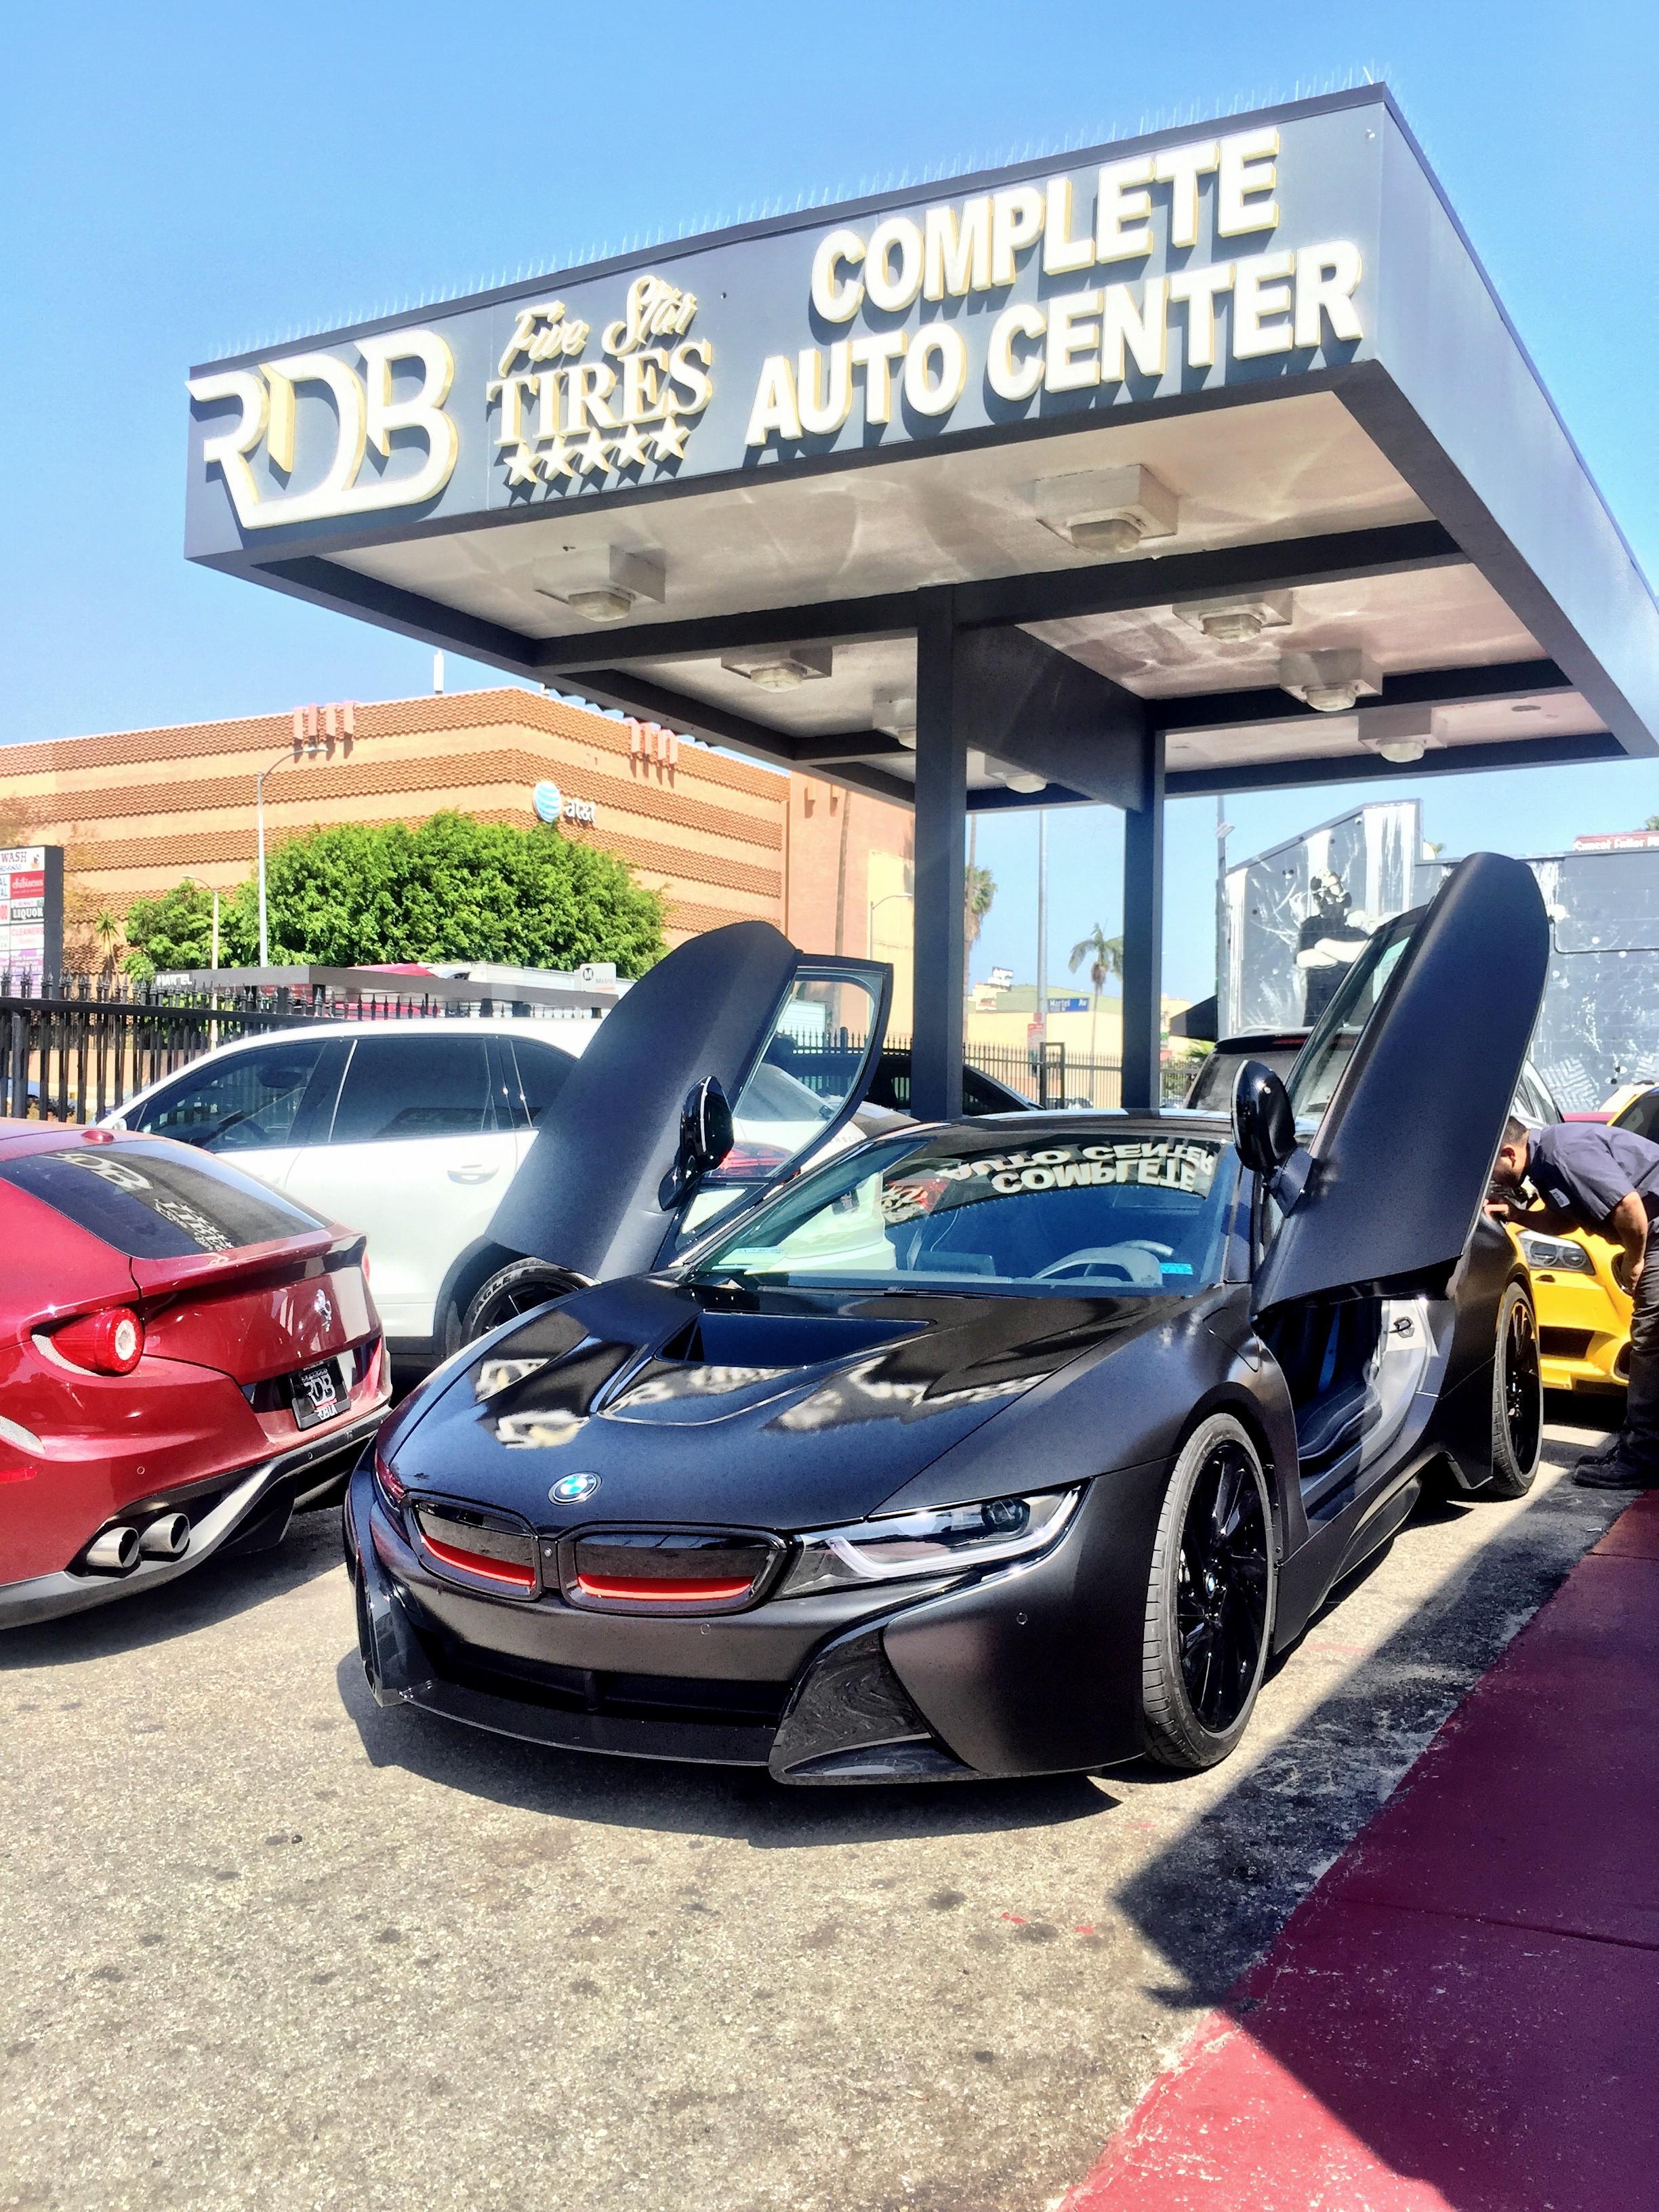 Lebron James Cars 2015